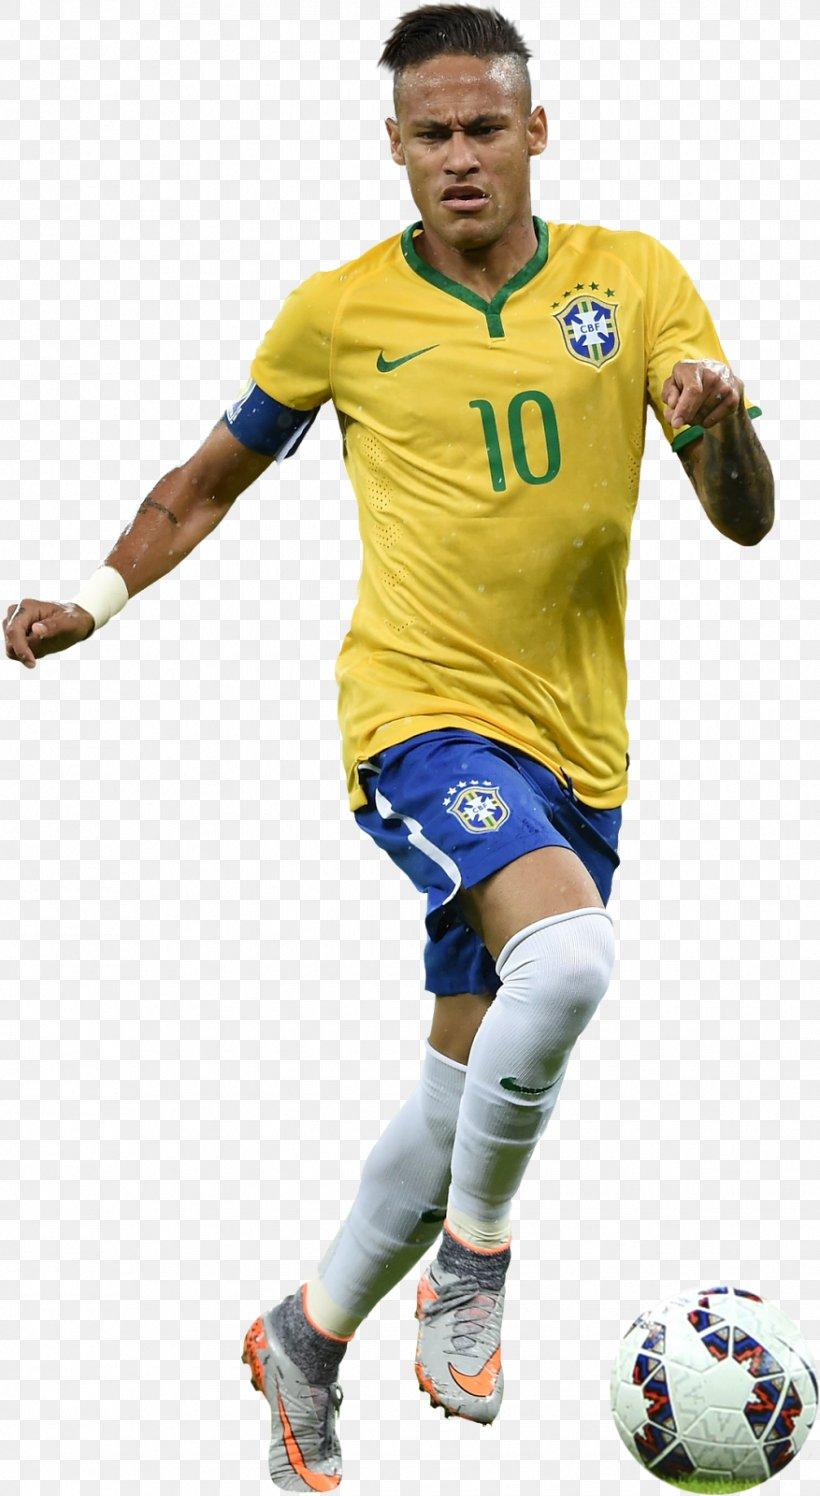 Neymar Brazil National Football Team FC Barcelona 2014 FIFA World Cup, PNG, 877x1600px, 2014 Fifa World Cup, Neymar, Athlete, Ball, Brazil Download Free